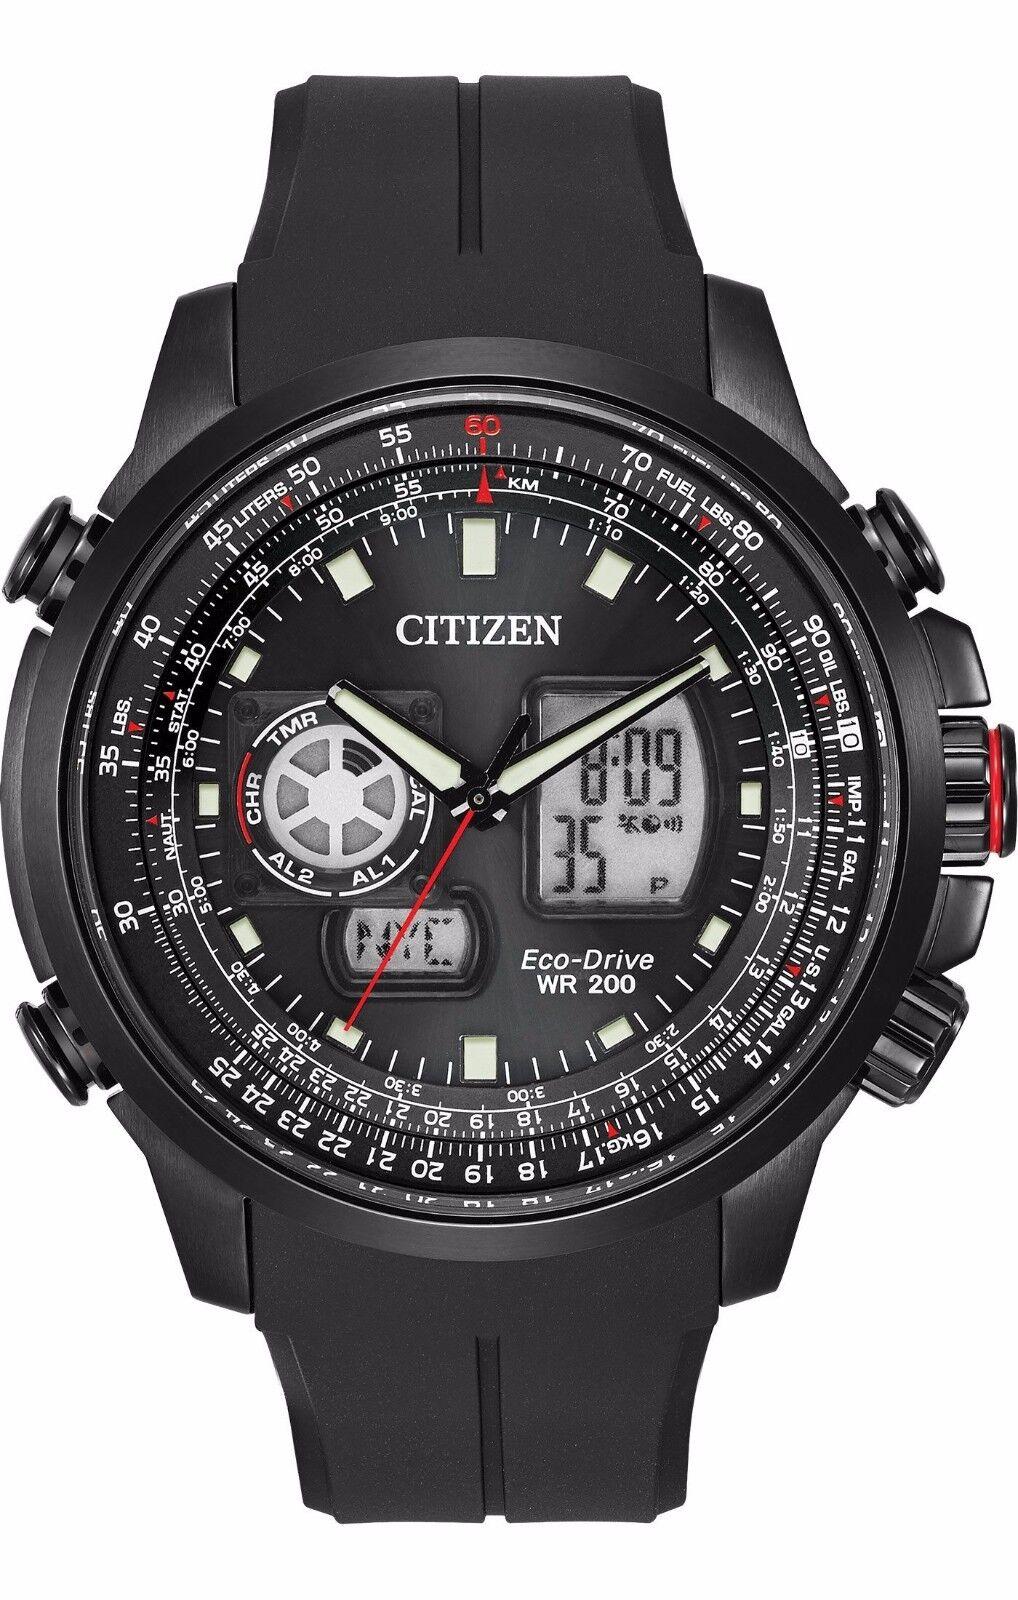 Cross – Border:- Citizen Eco-Drive Men's JZ1065-13E Promaster Air Black Polyurethane Band Watch low price